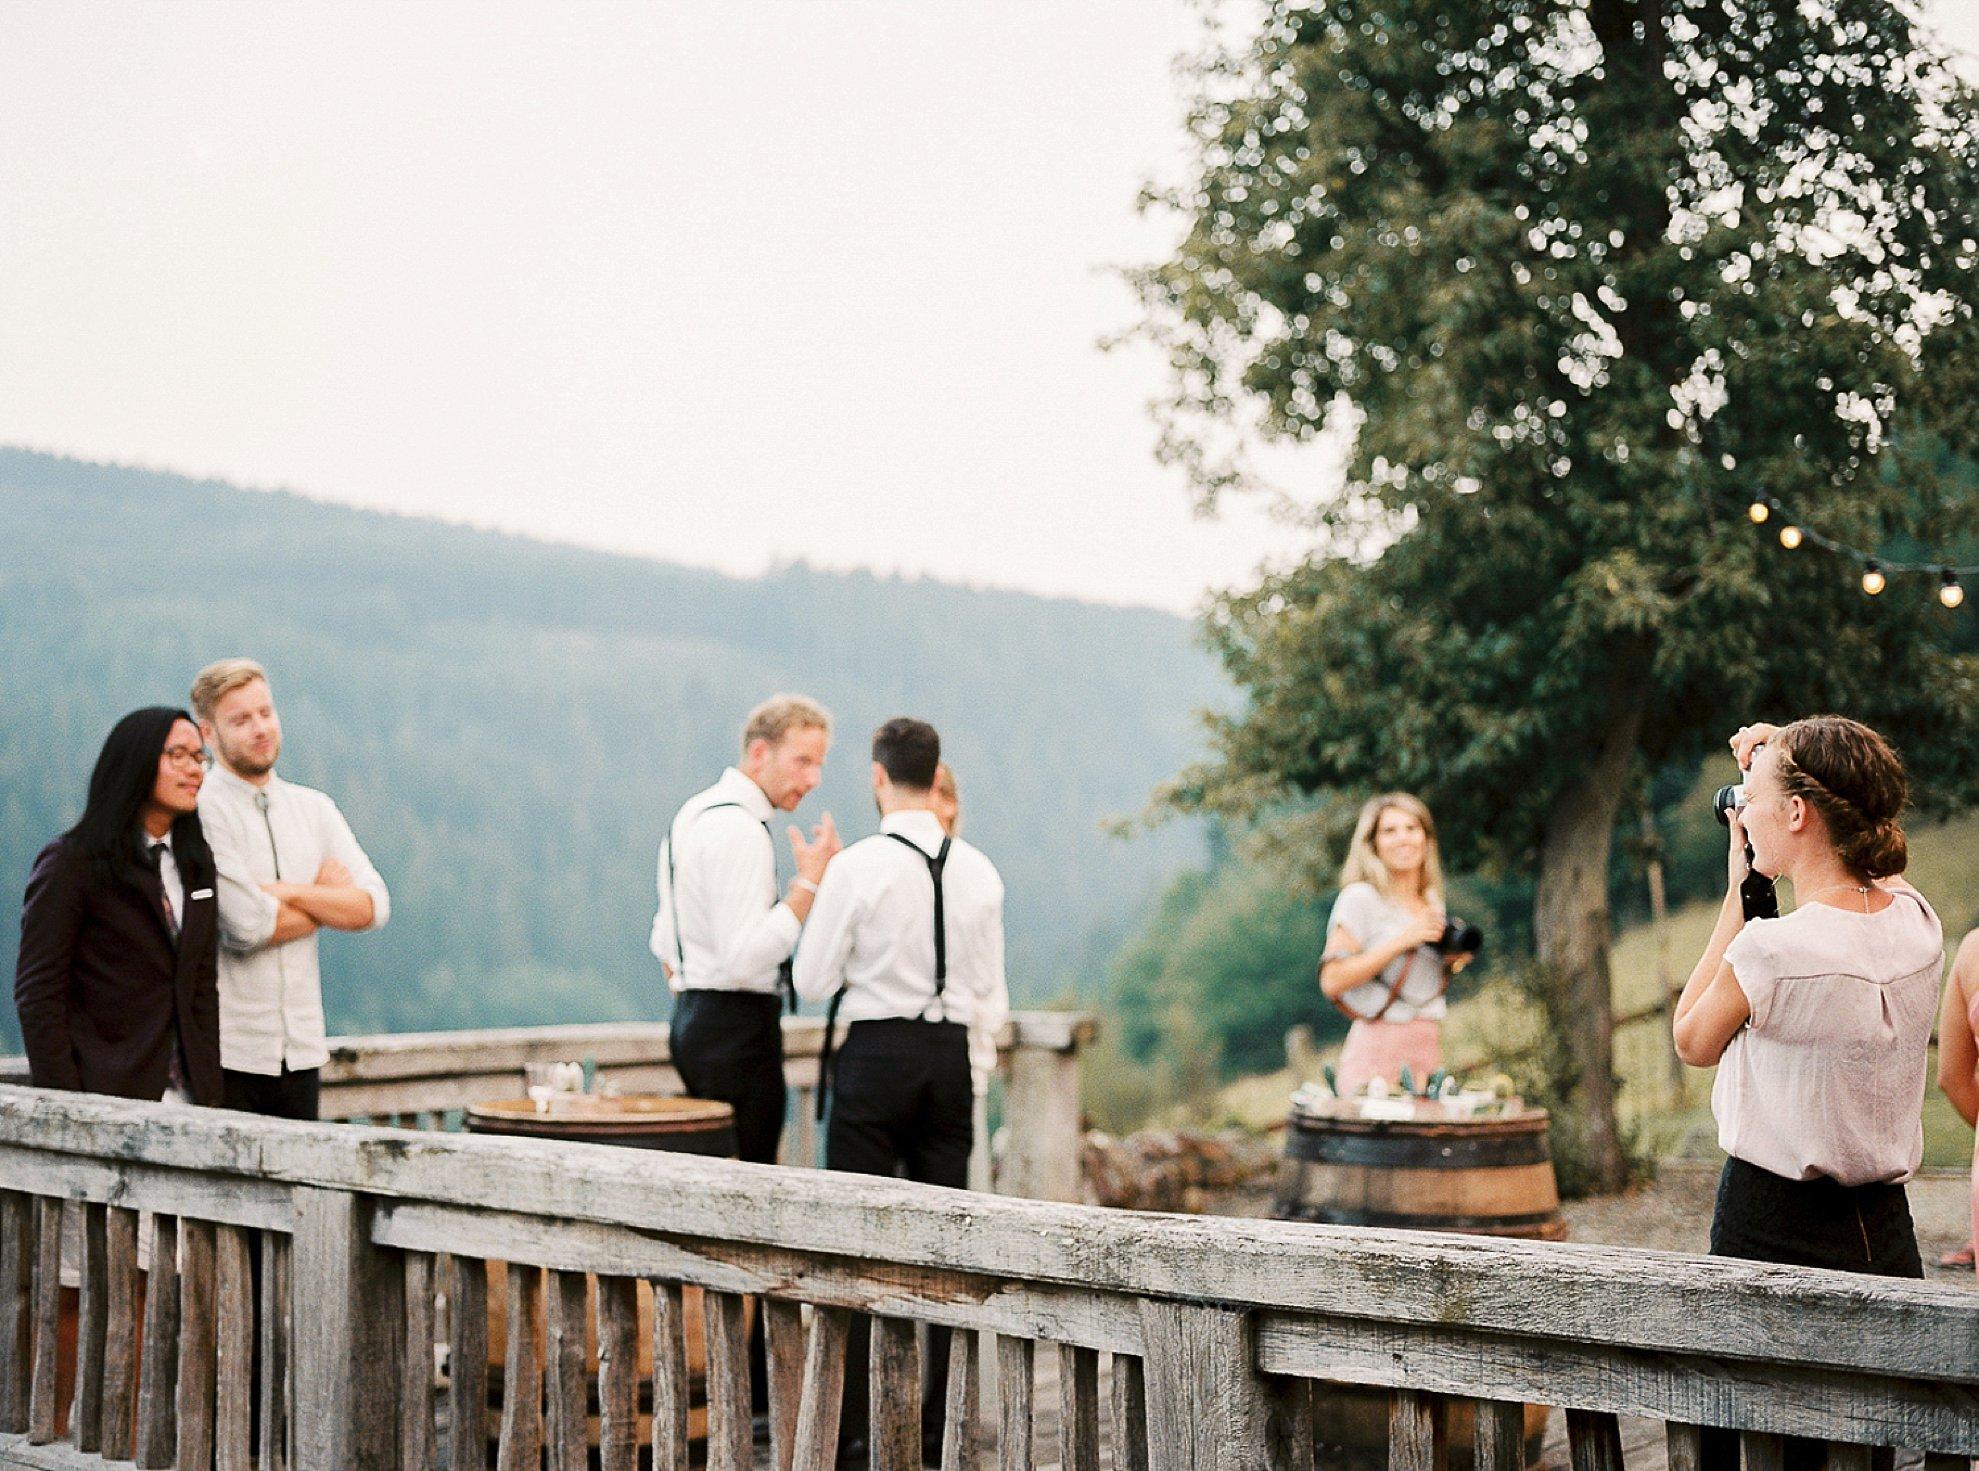 Amanda-Drost-Fotografie-Belgie-Photography-Wedding_0008.jpg